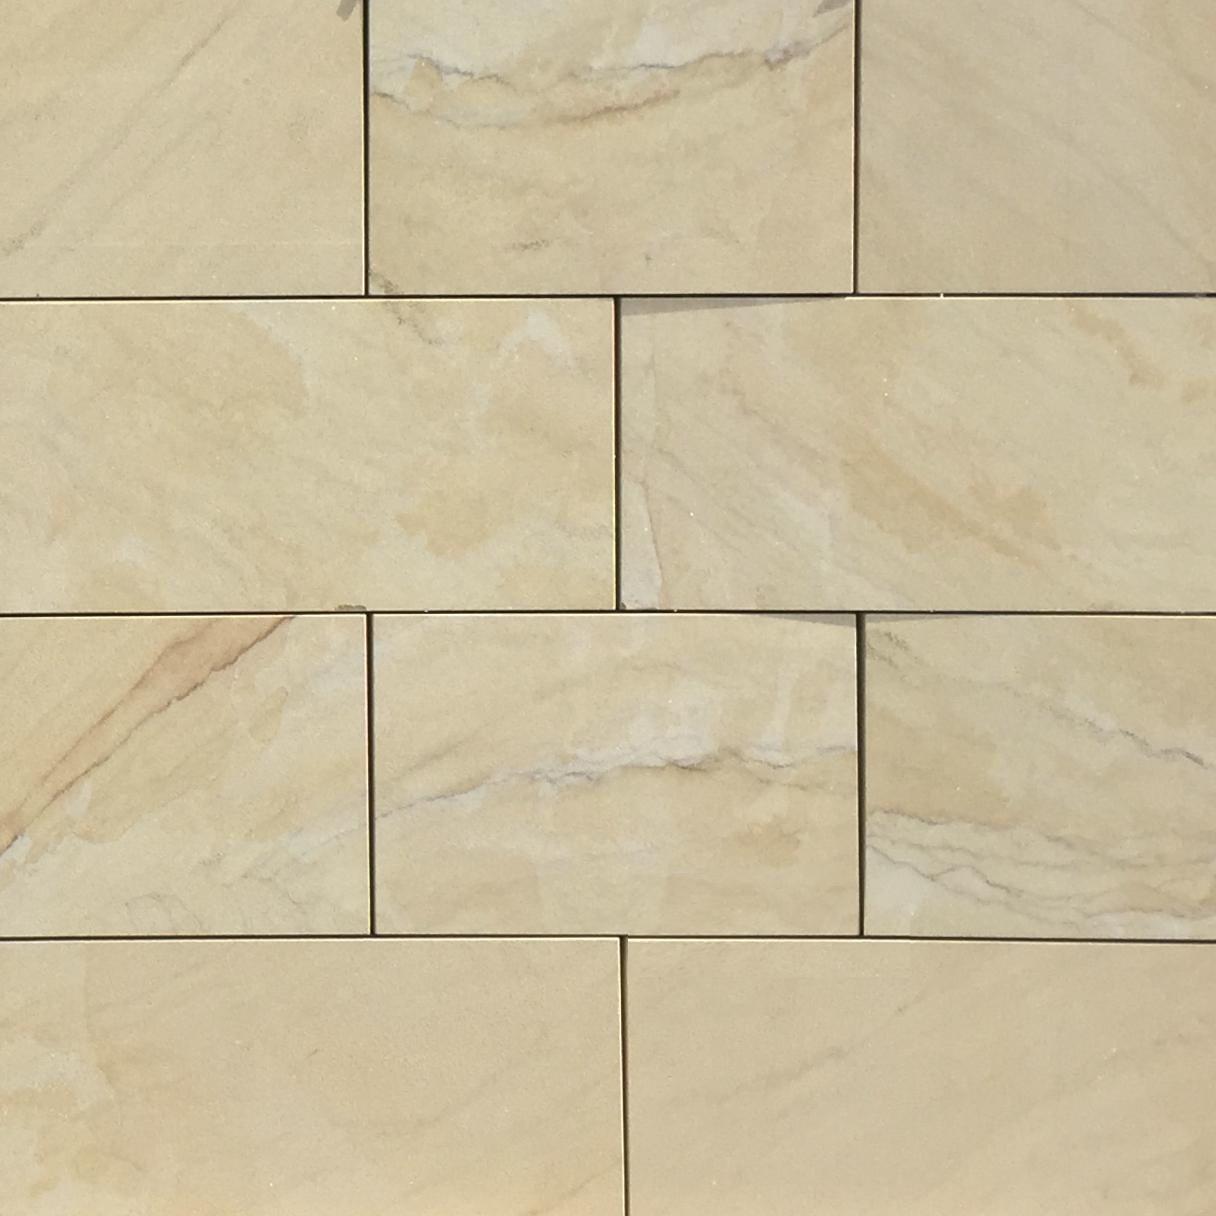 European Sandstone